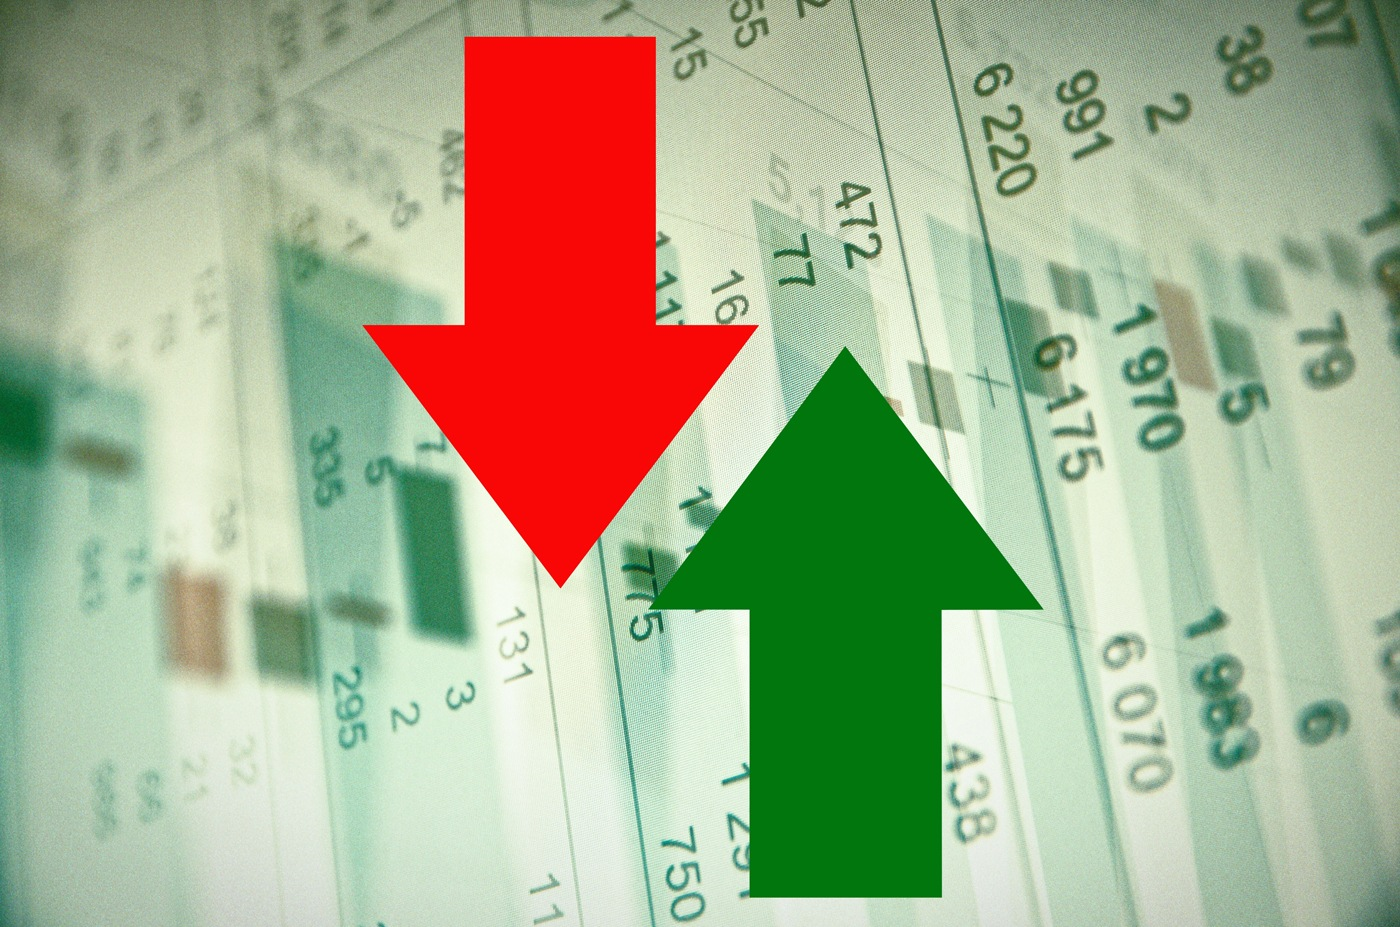 Bto binary options trading scams spurs v villa betting tips